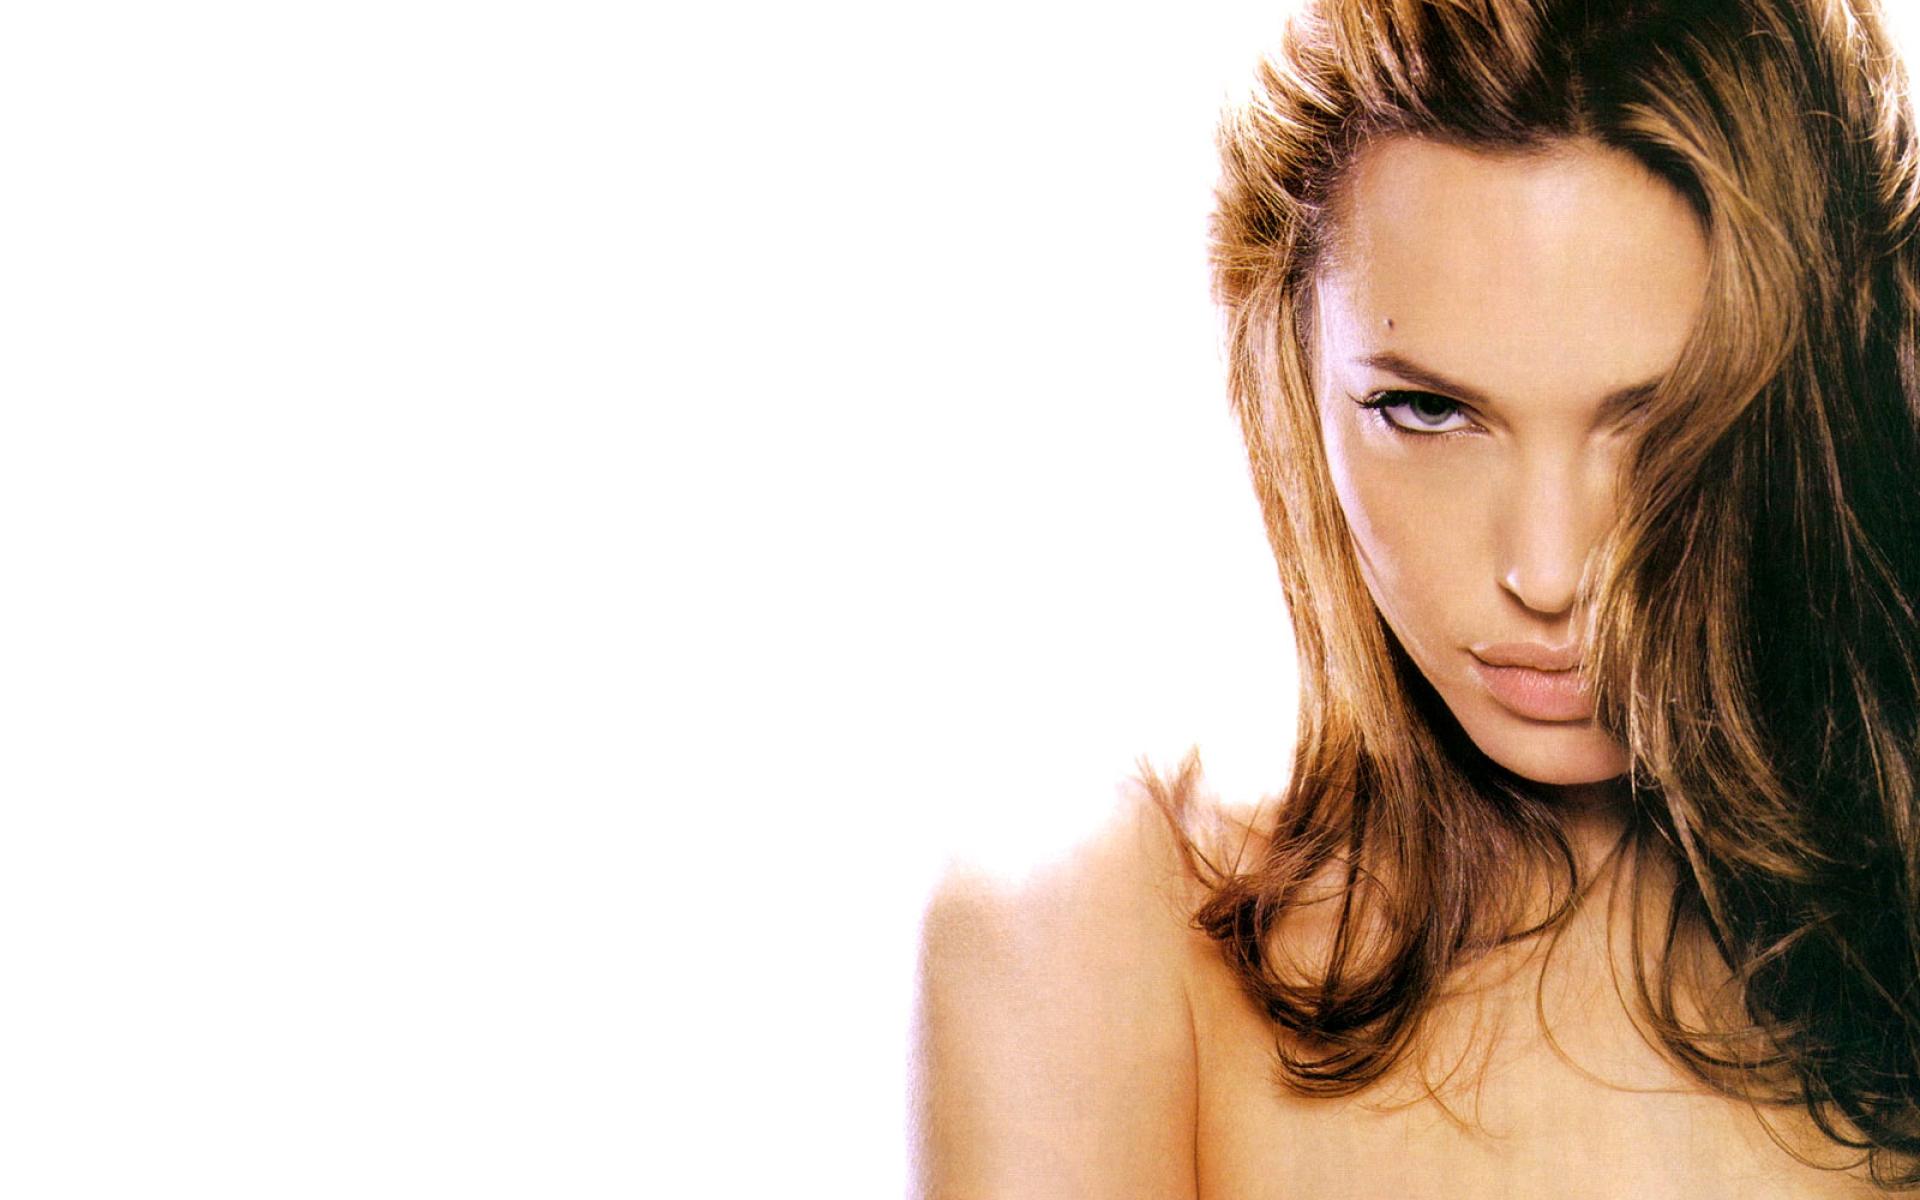 Angelina Jolie Topless Pics 1920x1200 angelina jolie topless pics 1200p wallpaper, hd